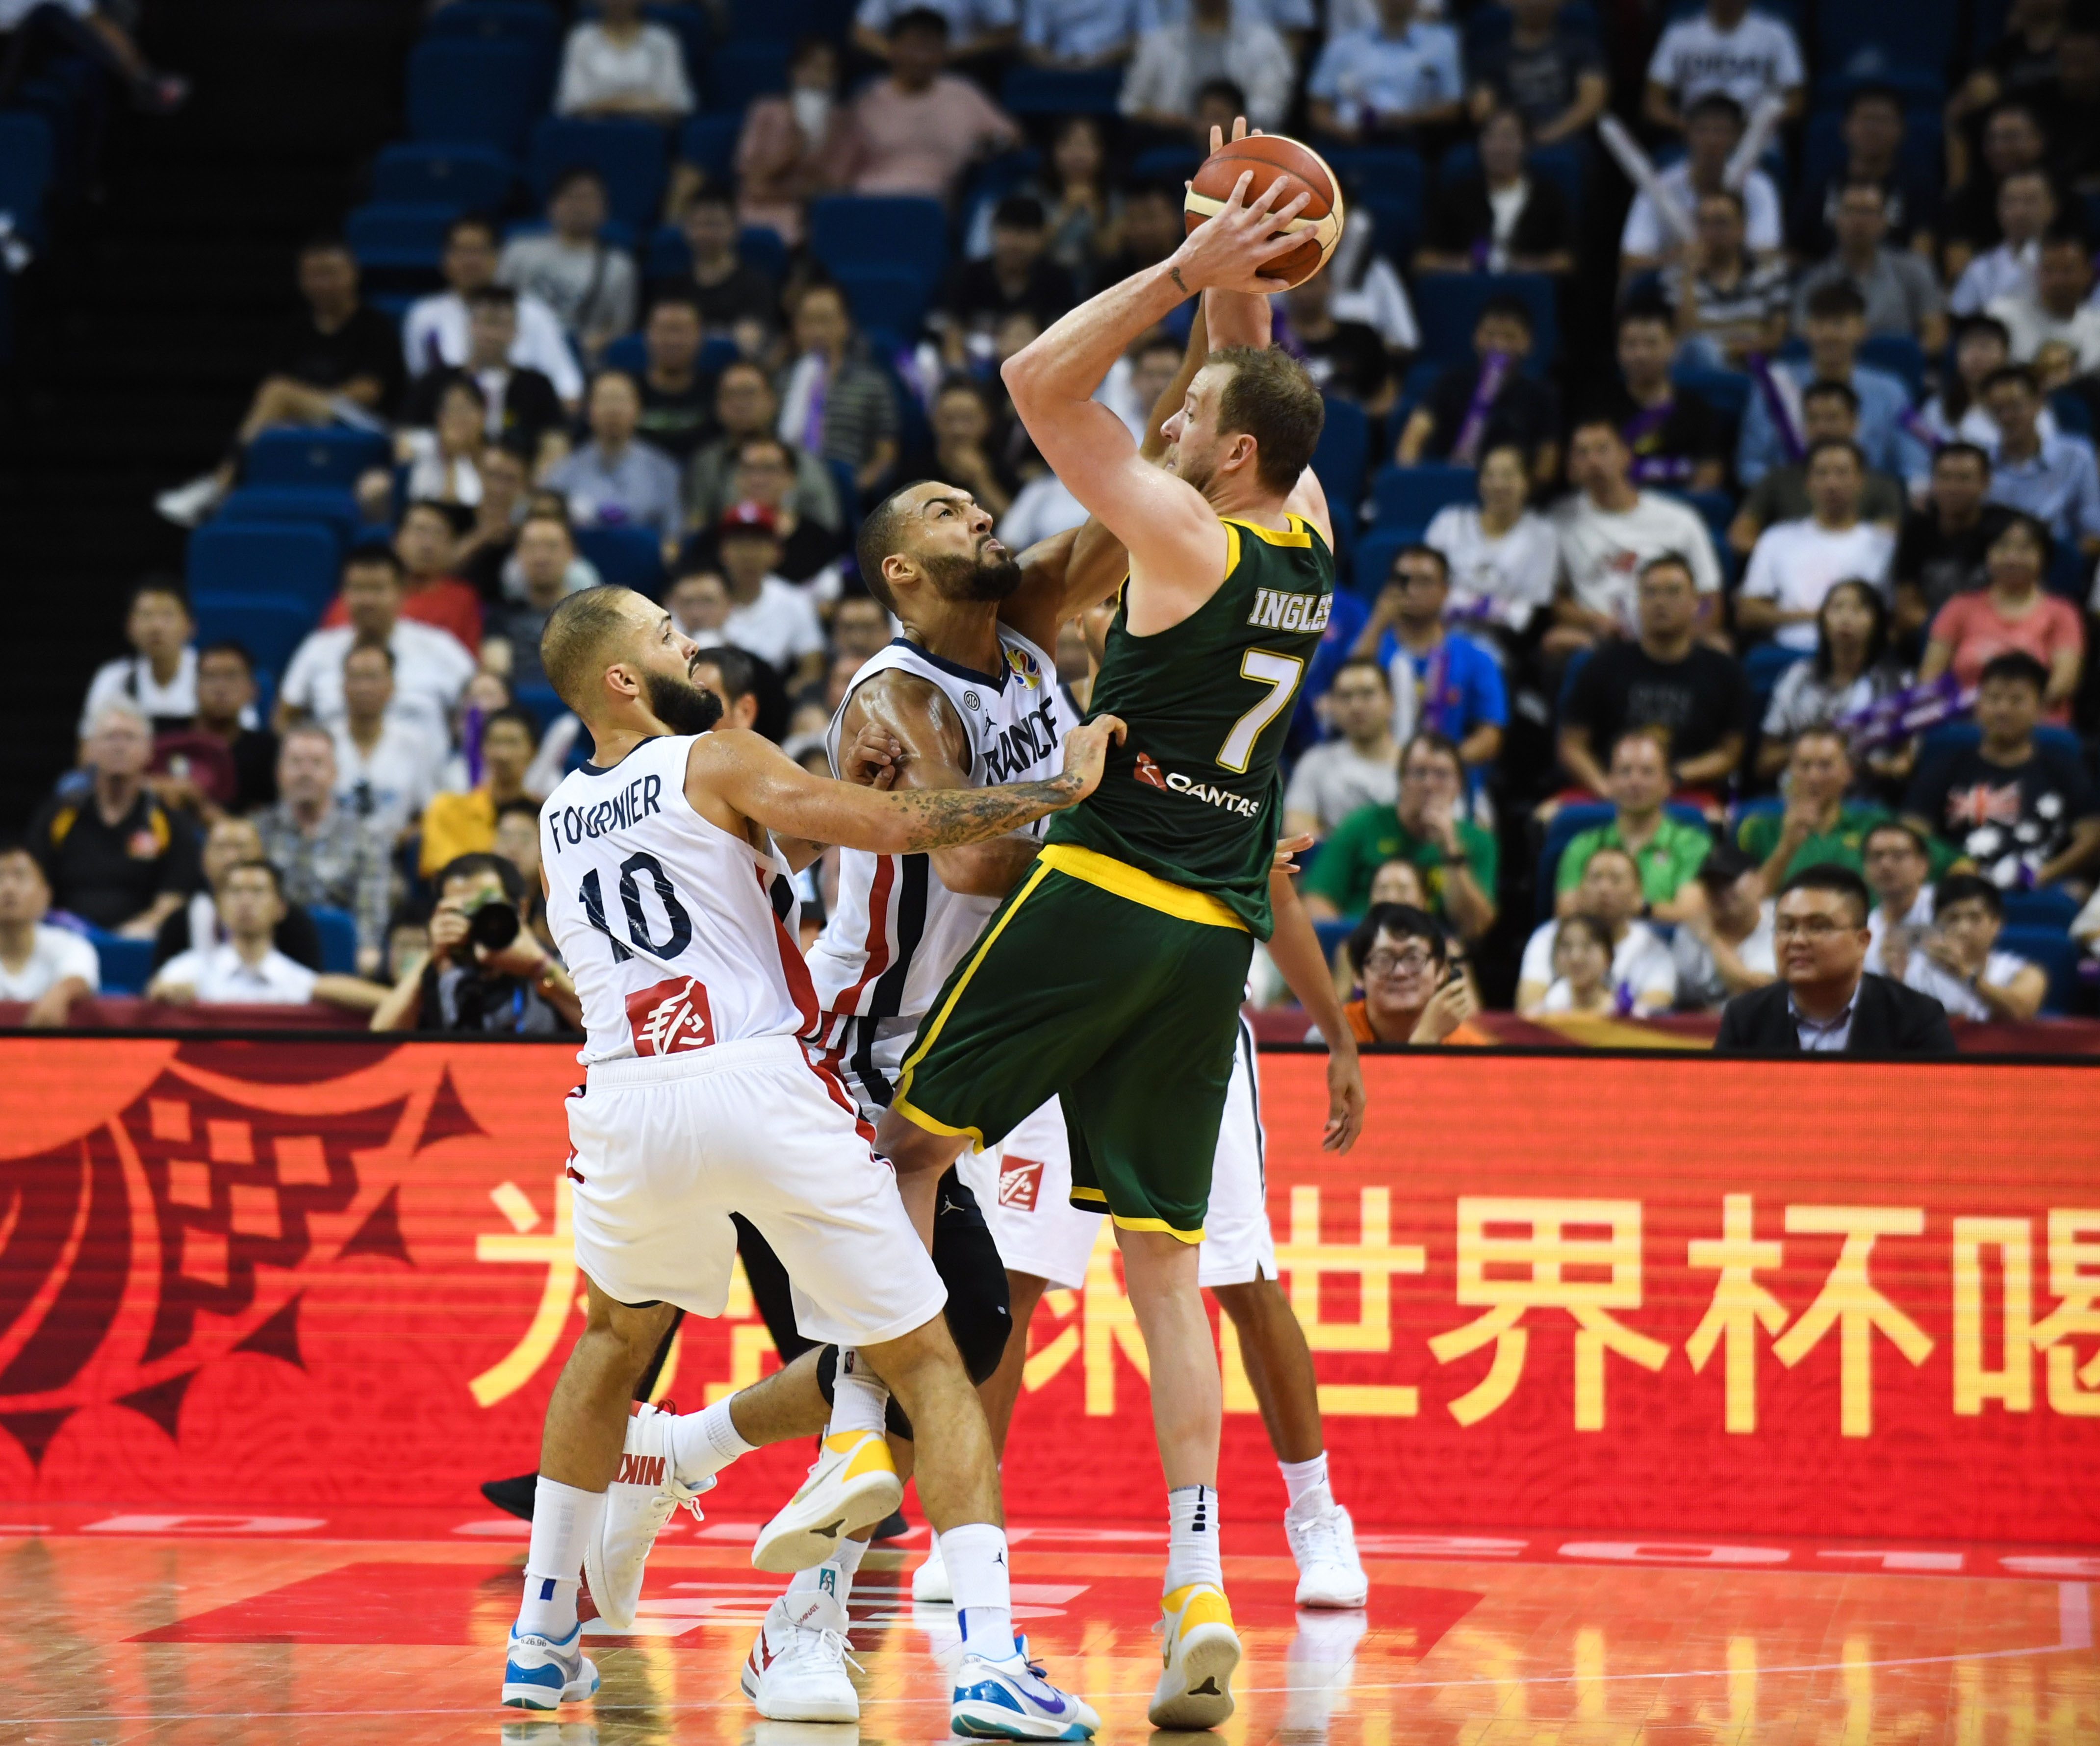 France v Australia - FIBA Basketball World Cup 2019